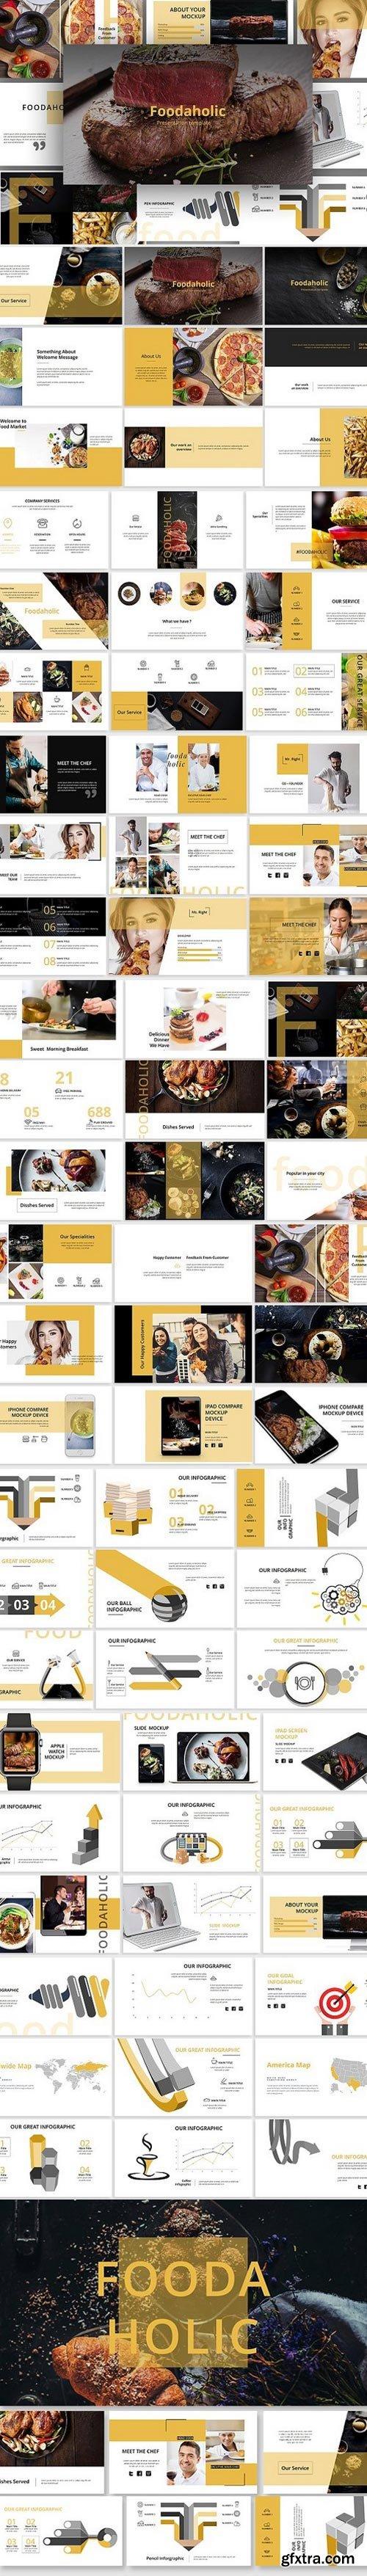 Foodaholic Creative Keynote Template